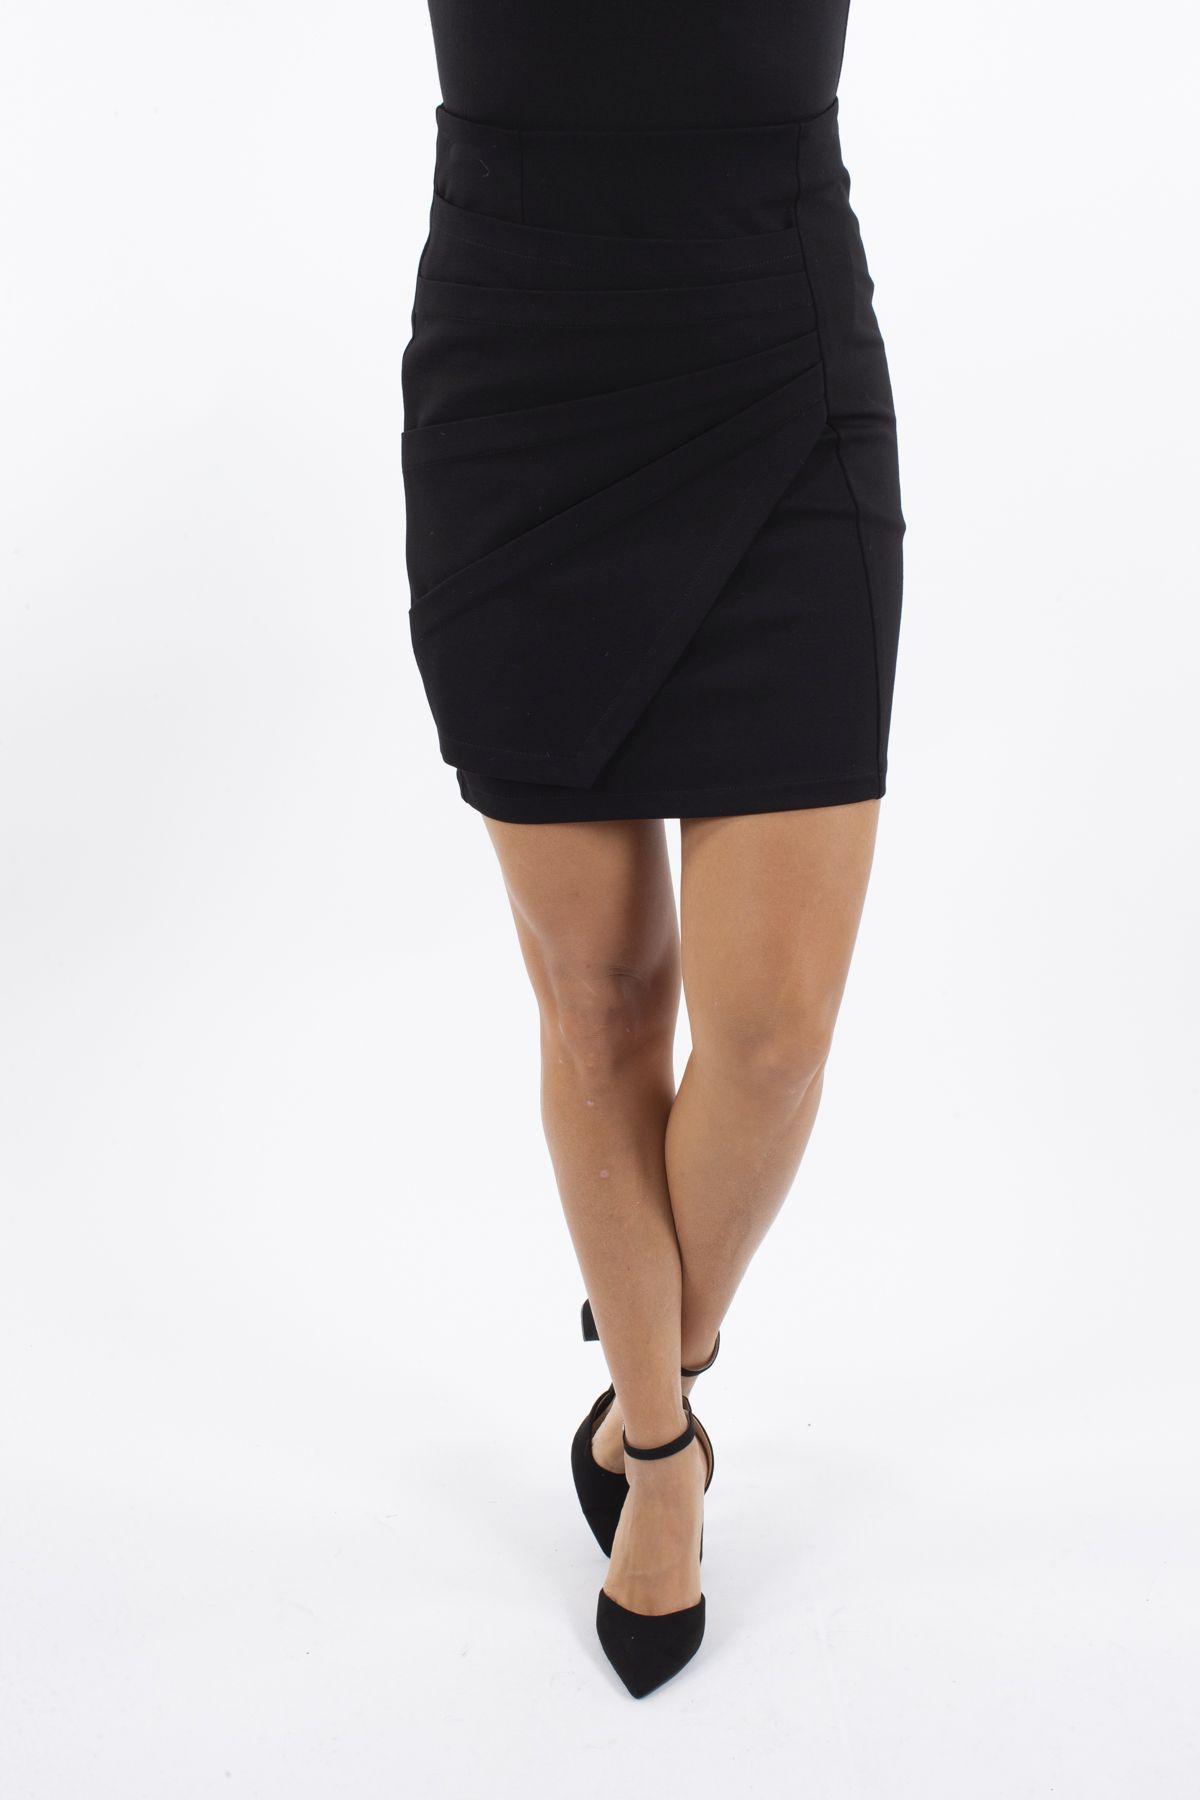 TUBE SKIRT IN PUNTO MILANO FABRIC  for woman - BLACK - Paquito Pronto Moda Shop Online